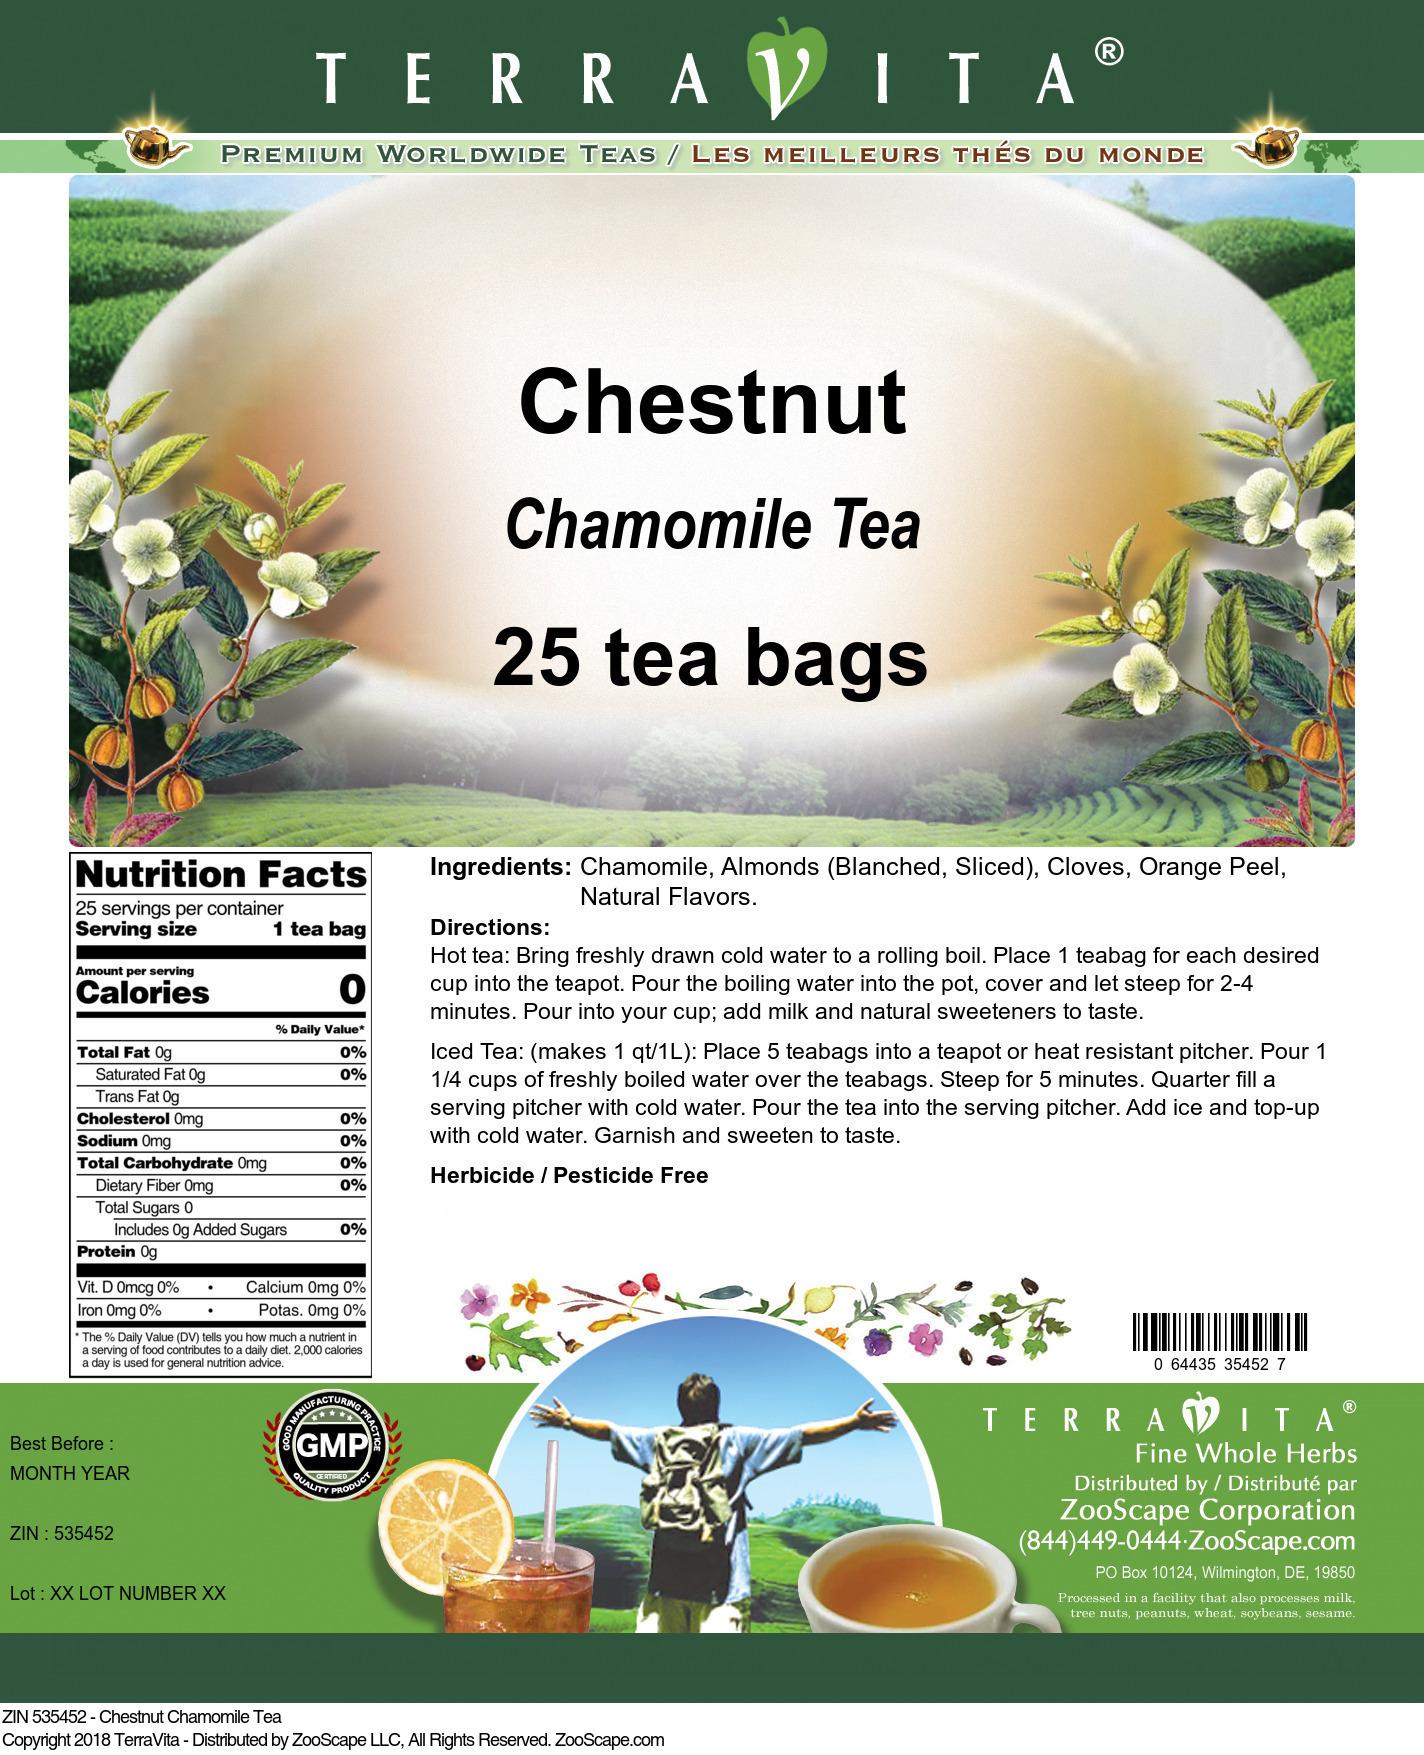 Chestnut Chamomile Tea